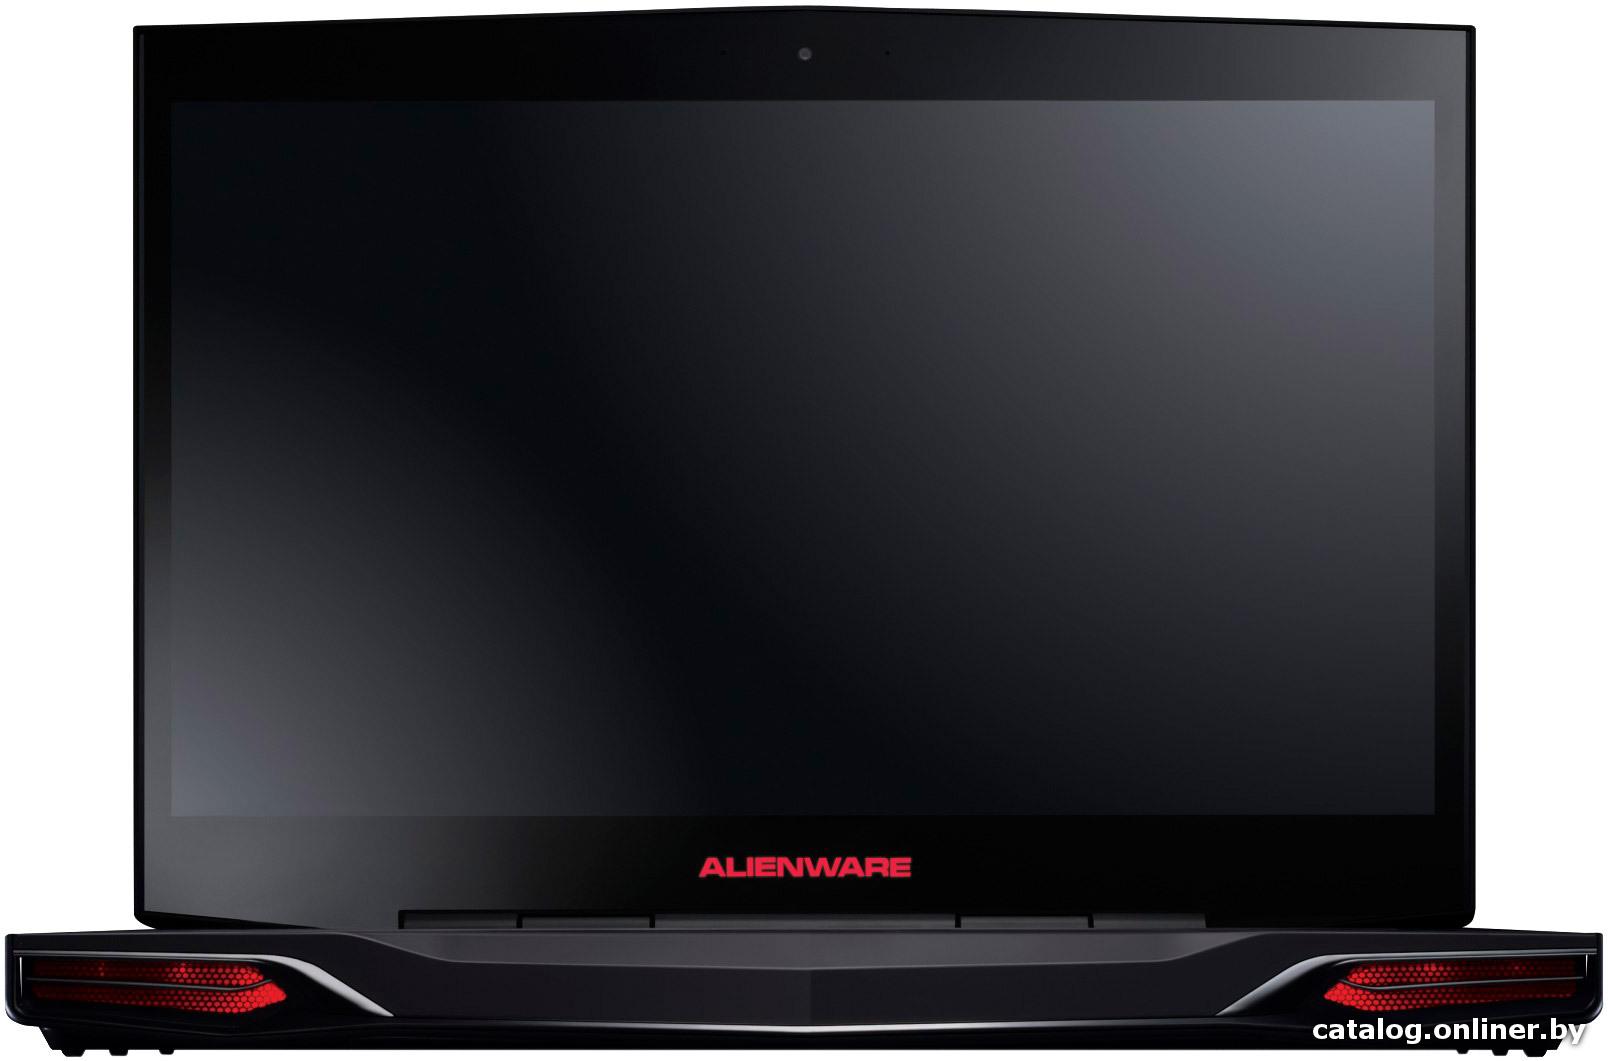 Dell Alienware M17x R4 (i7361FHDG16H75HD797) ноутбук купить в Минске 8003fa7ab6e